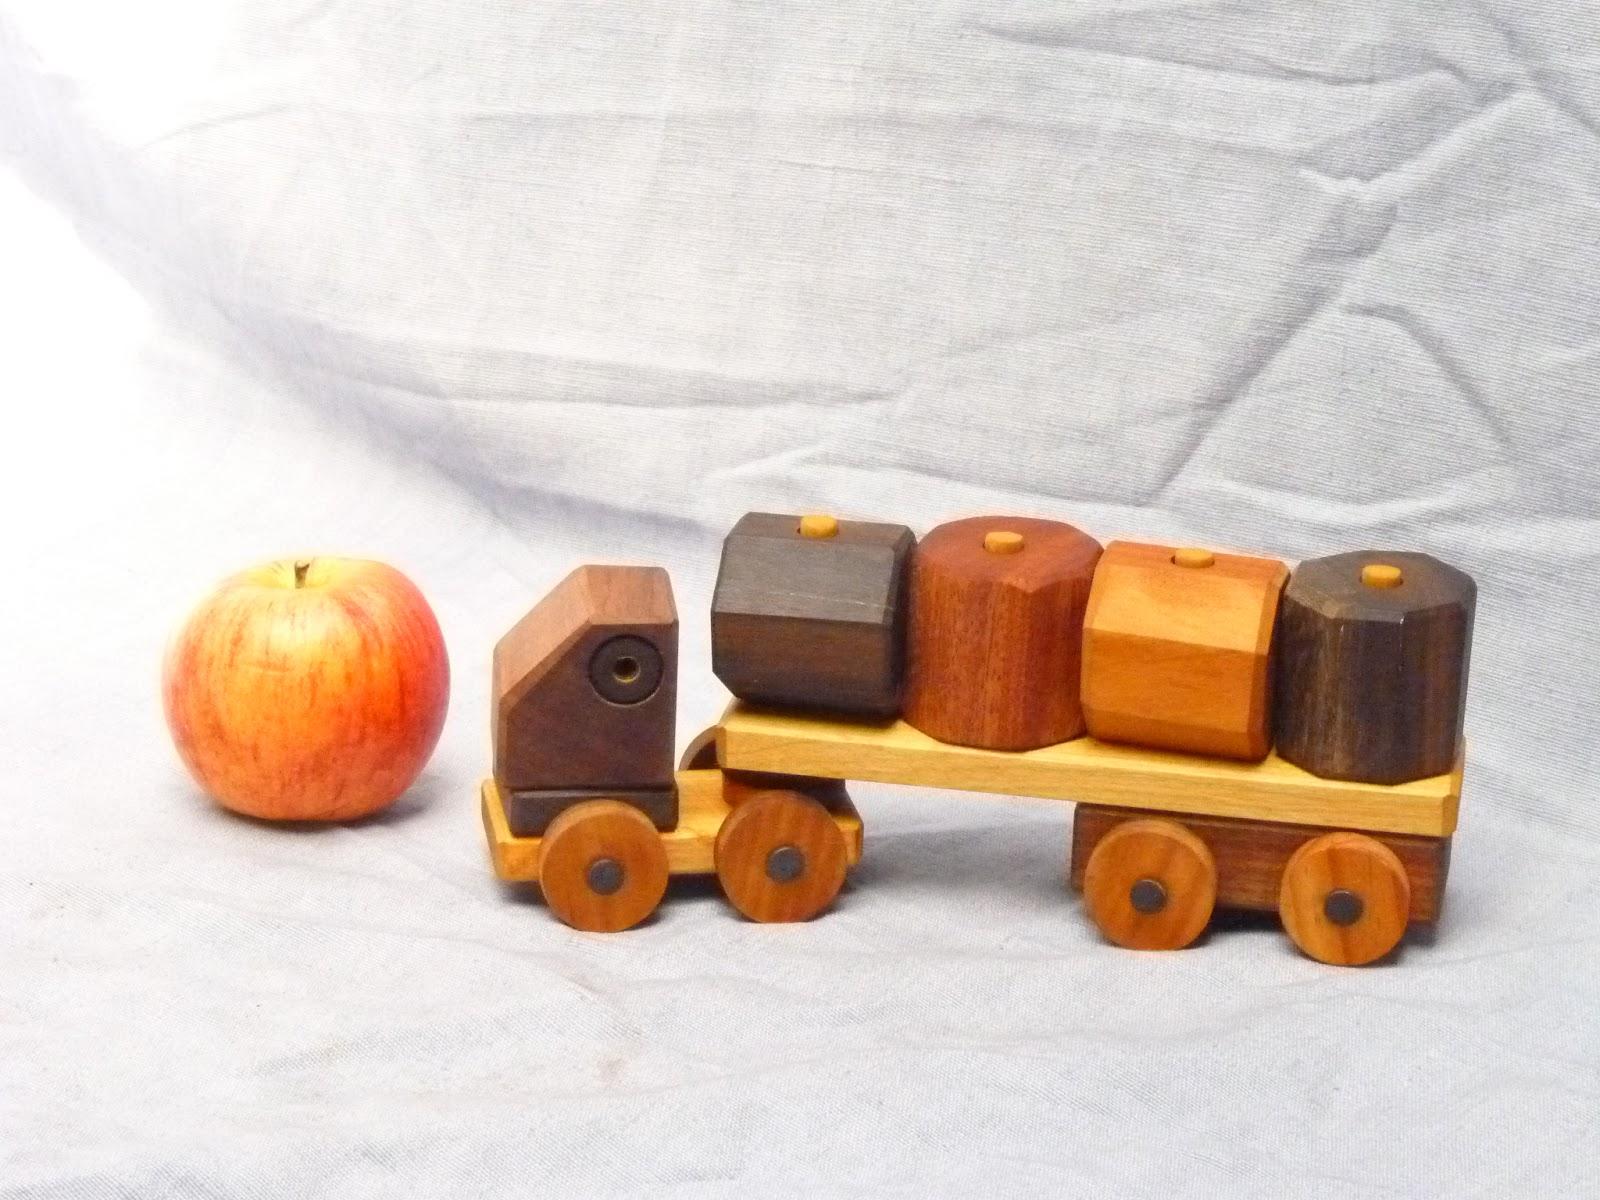 sitio checo espectáculo de juguete en Baracaldo